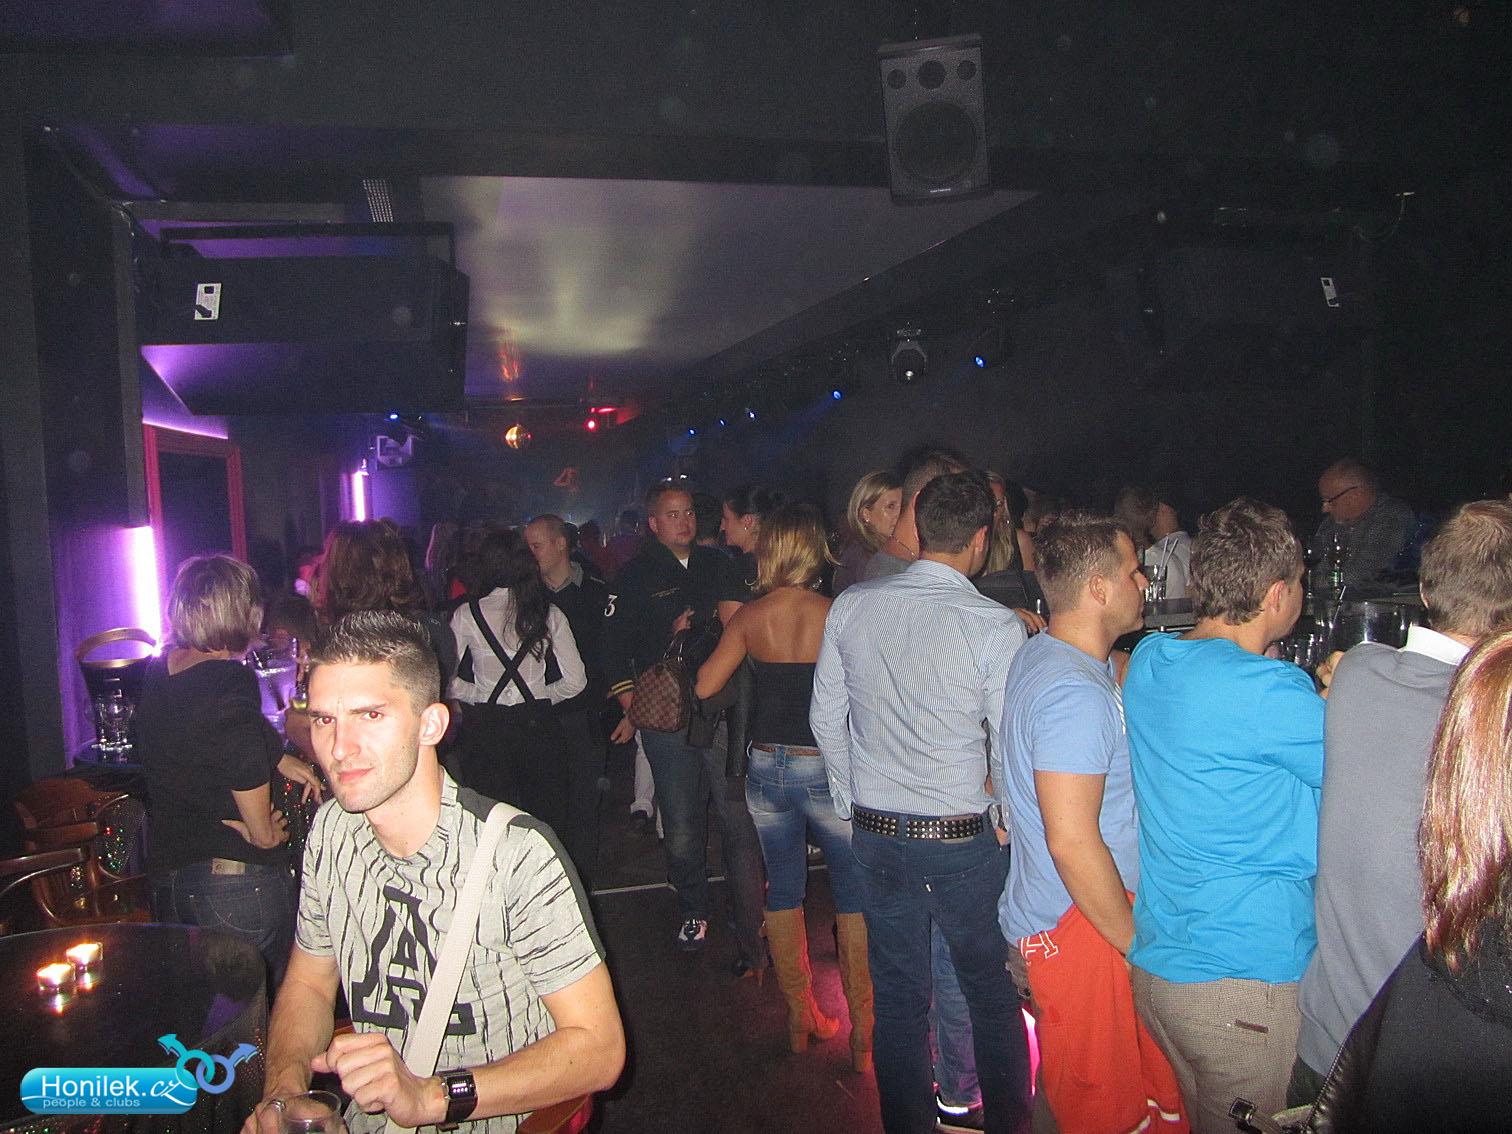 Nj gay club